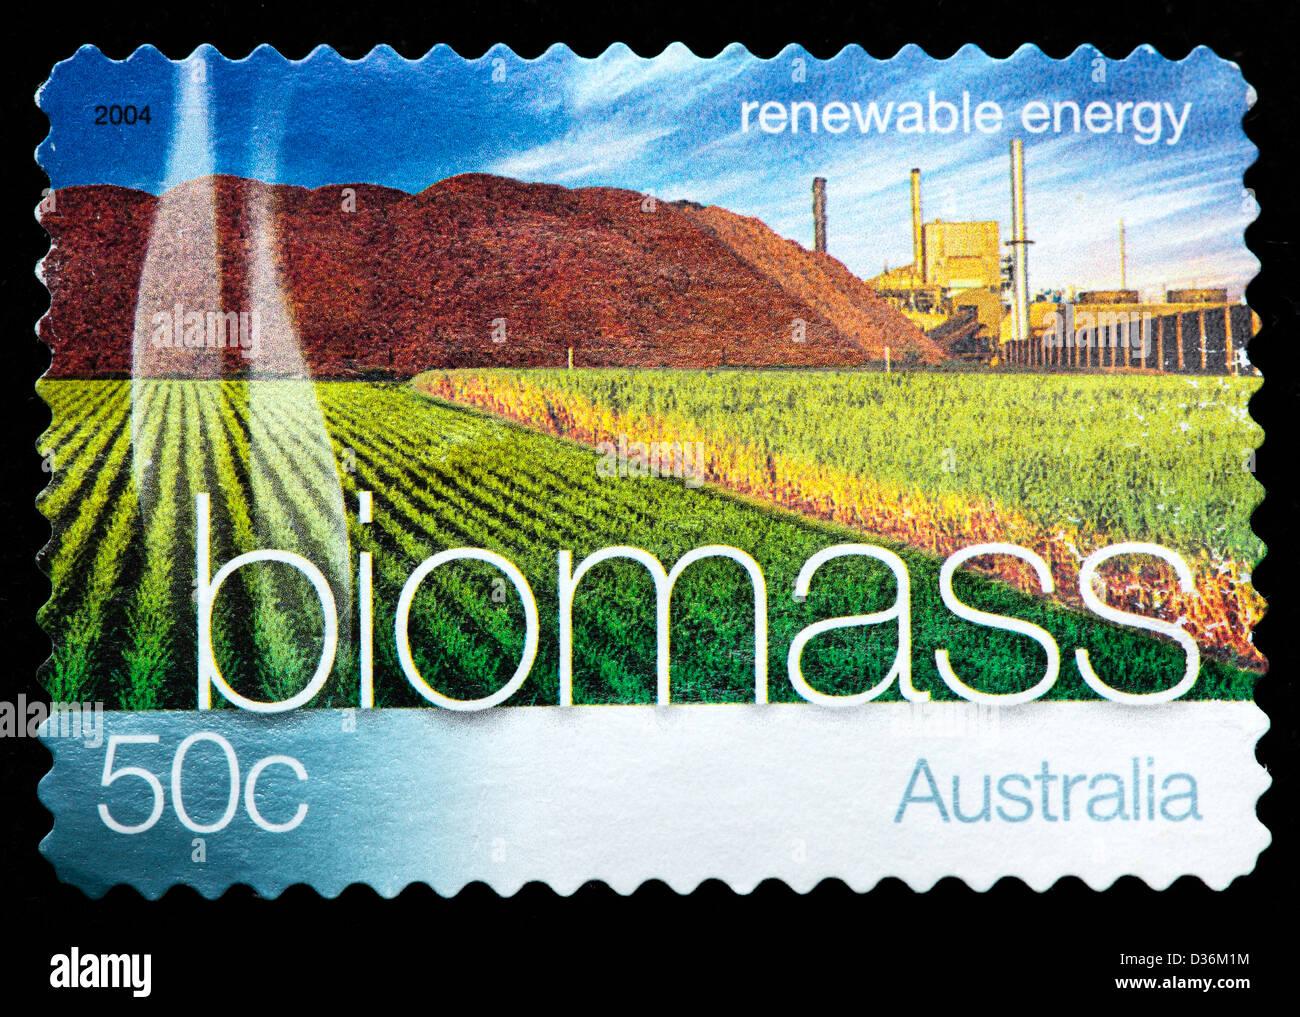 Biomass, Renewable energy, postage stamp, Australia, 2004 - Stock Image